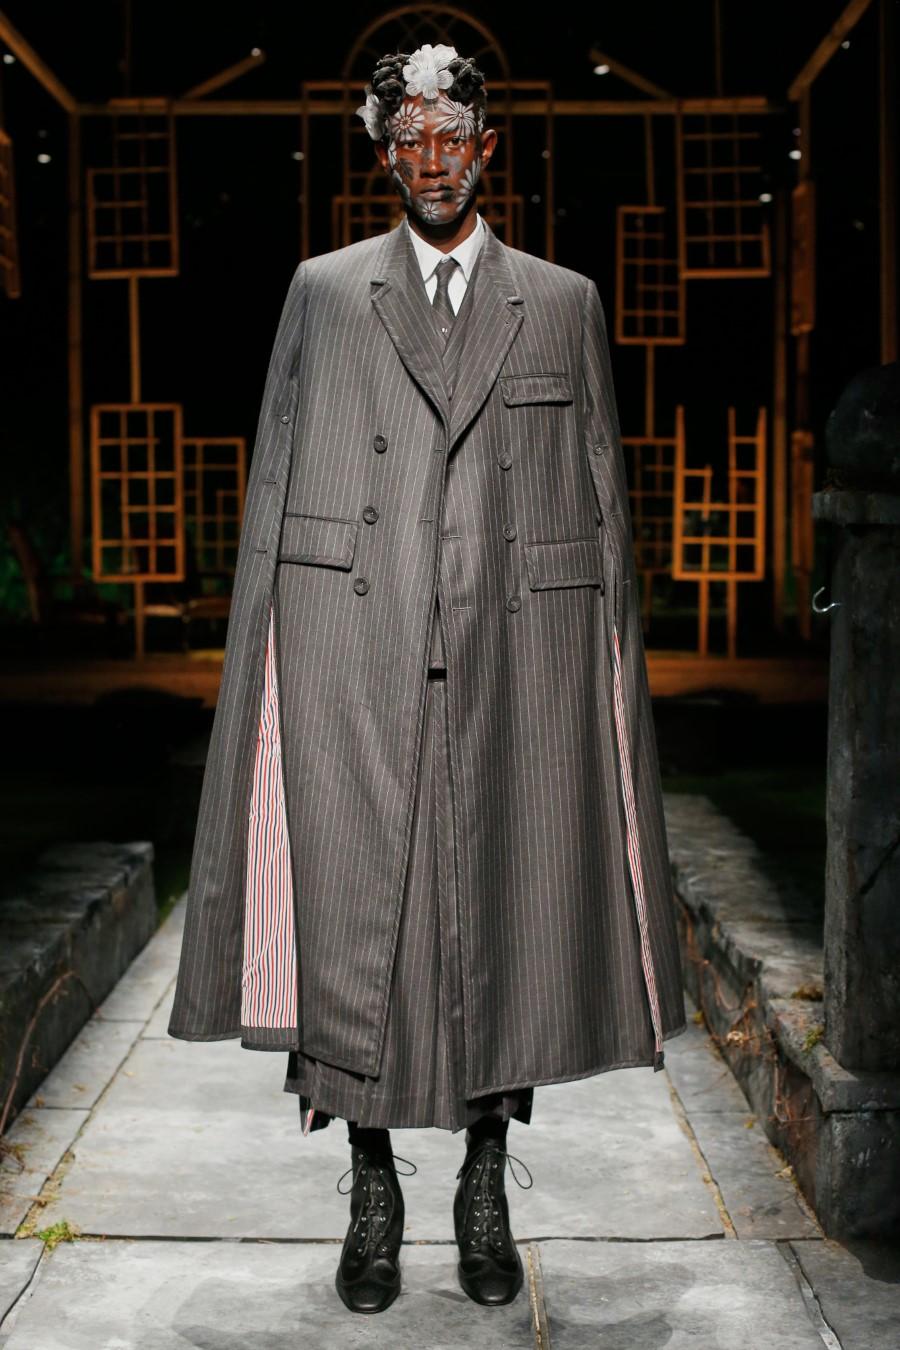 Thom Browne Spring Summer 2022 - New York Fashion WeekThom Browne Spring Summer 2022 - New York Fashion Week